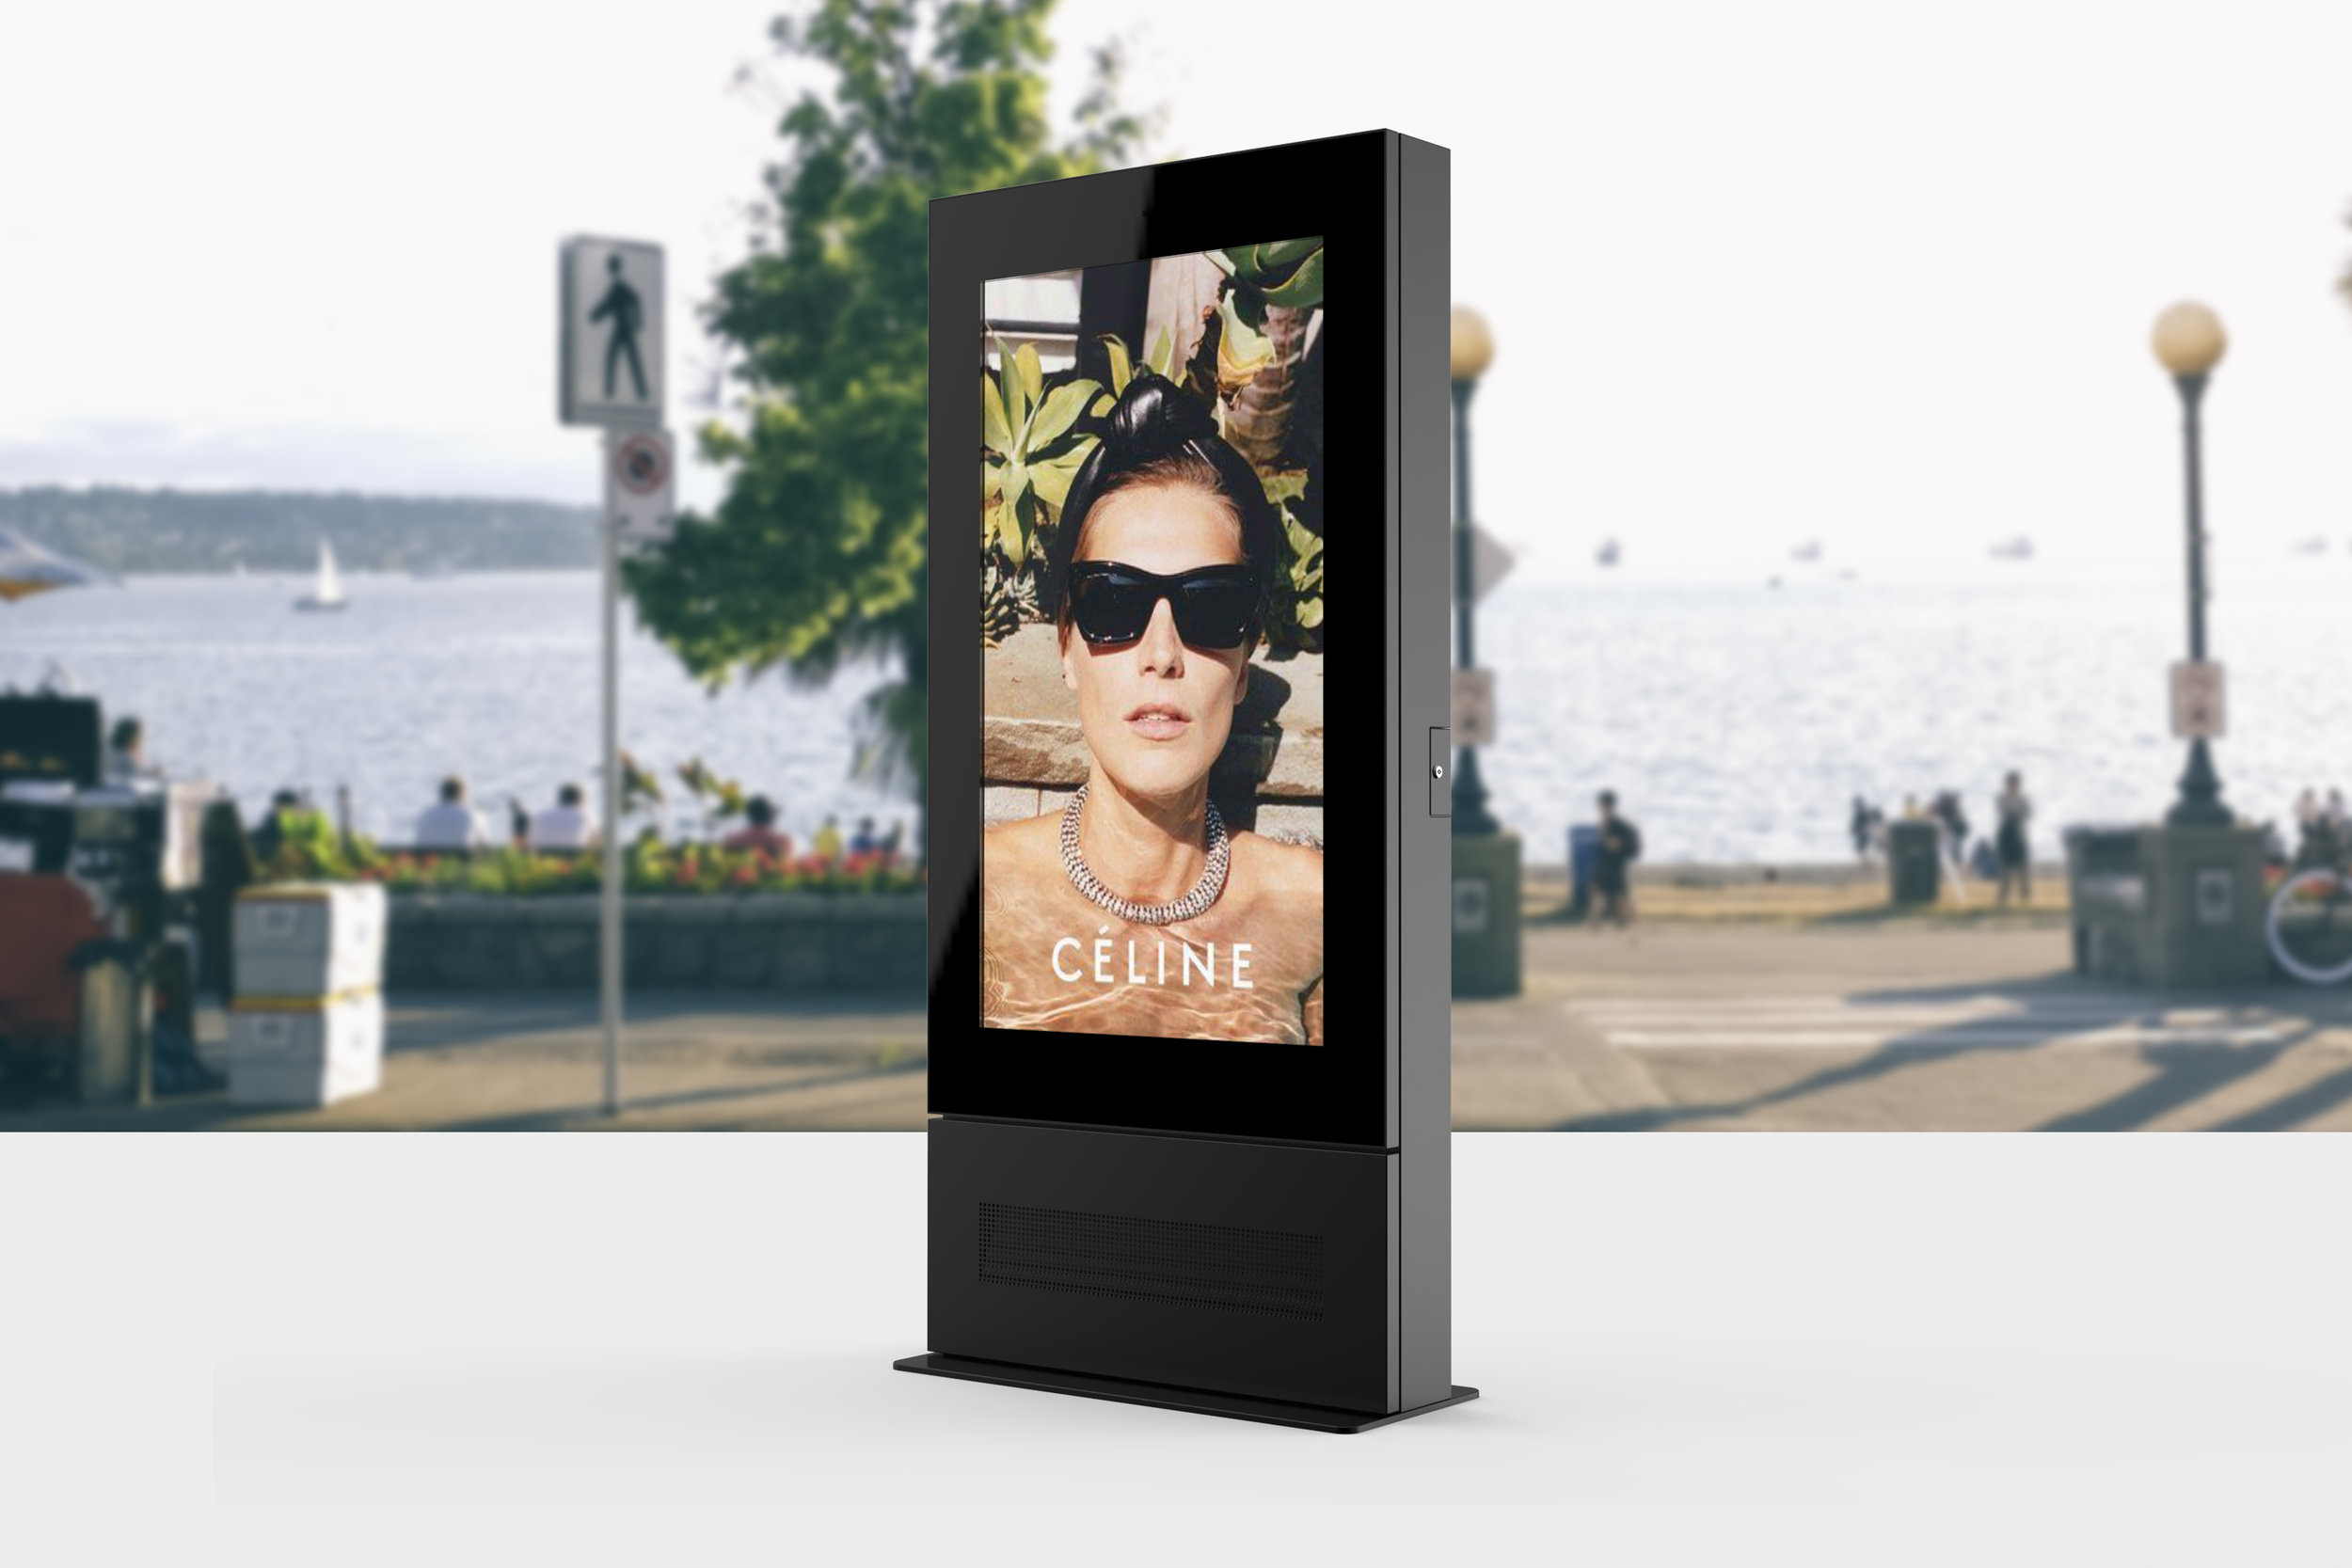 keewin display 75 inch Outdoor Large Displays-1.jpg